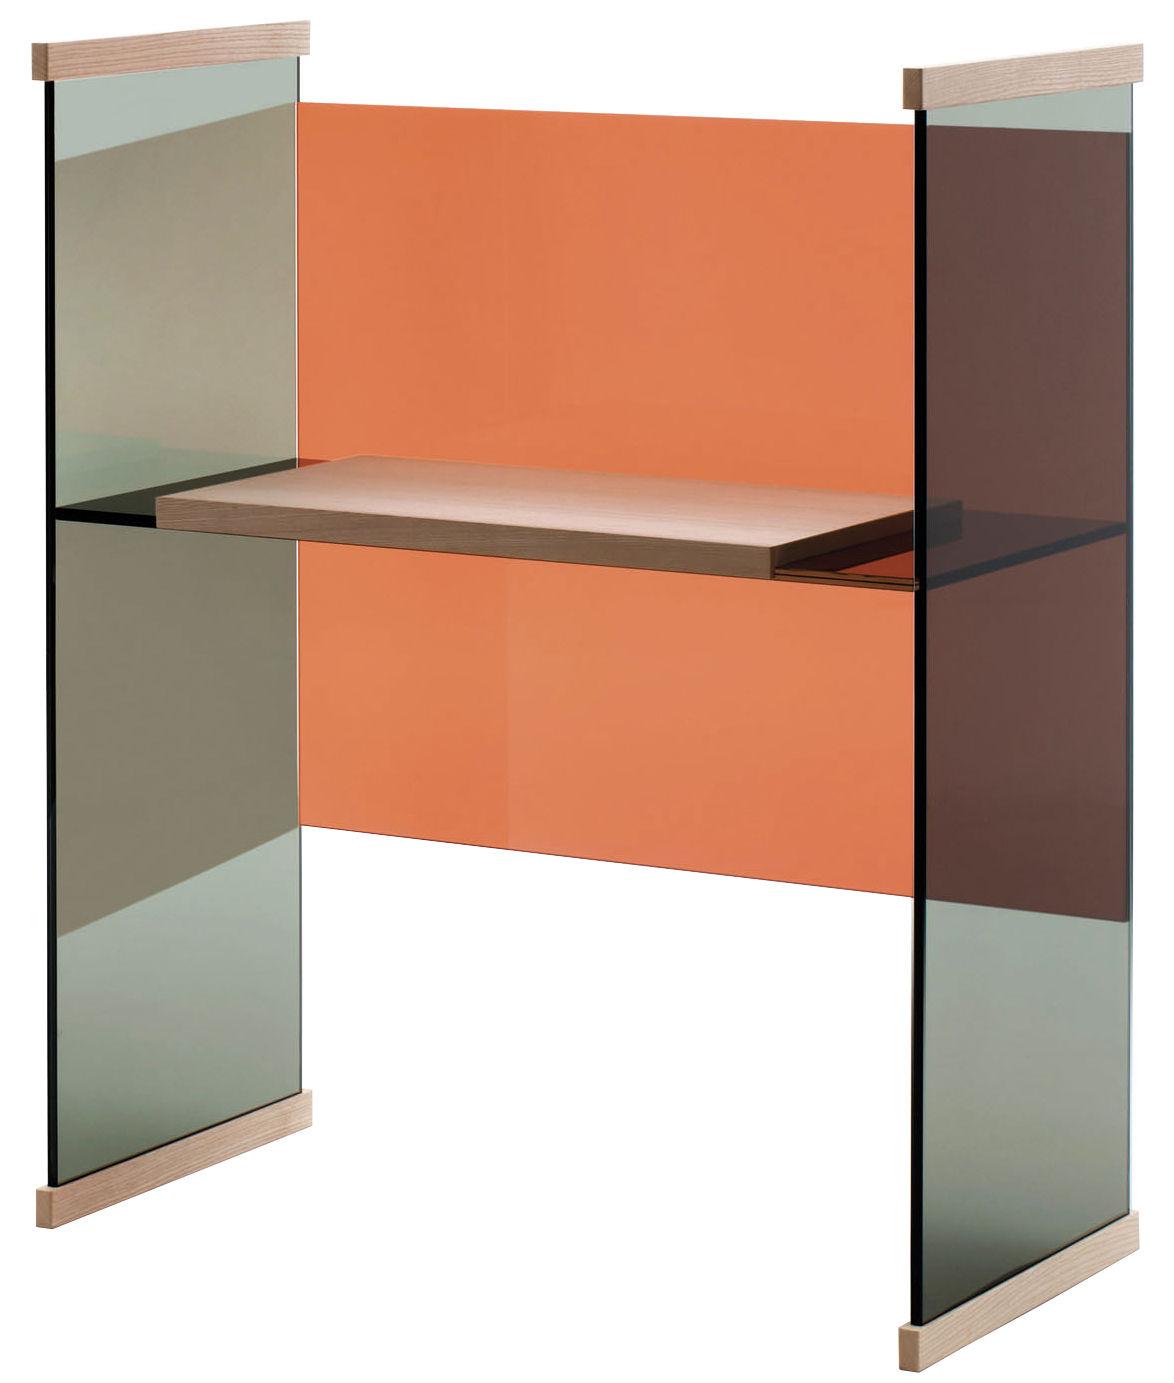 Furniture - Office Furniture - Diapositive Desk by Glas Italia - Back orange - Top and sides gris foncé - Ashwood, Glass